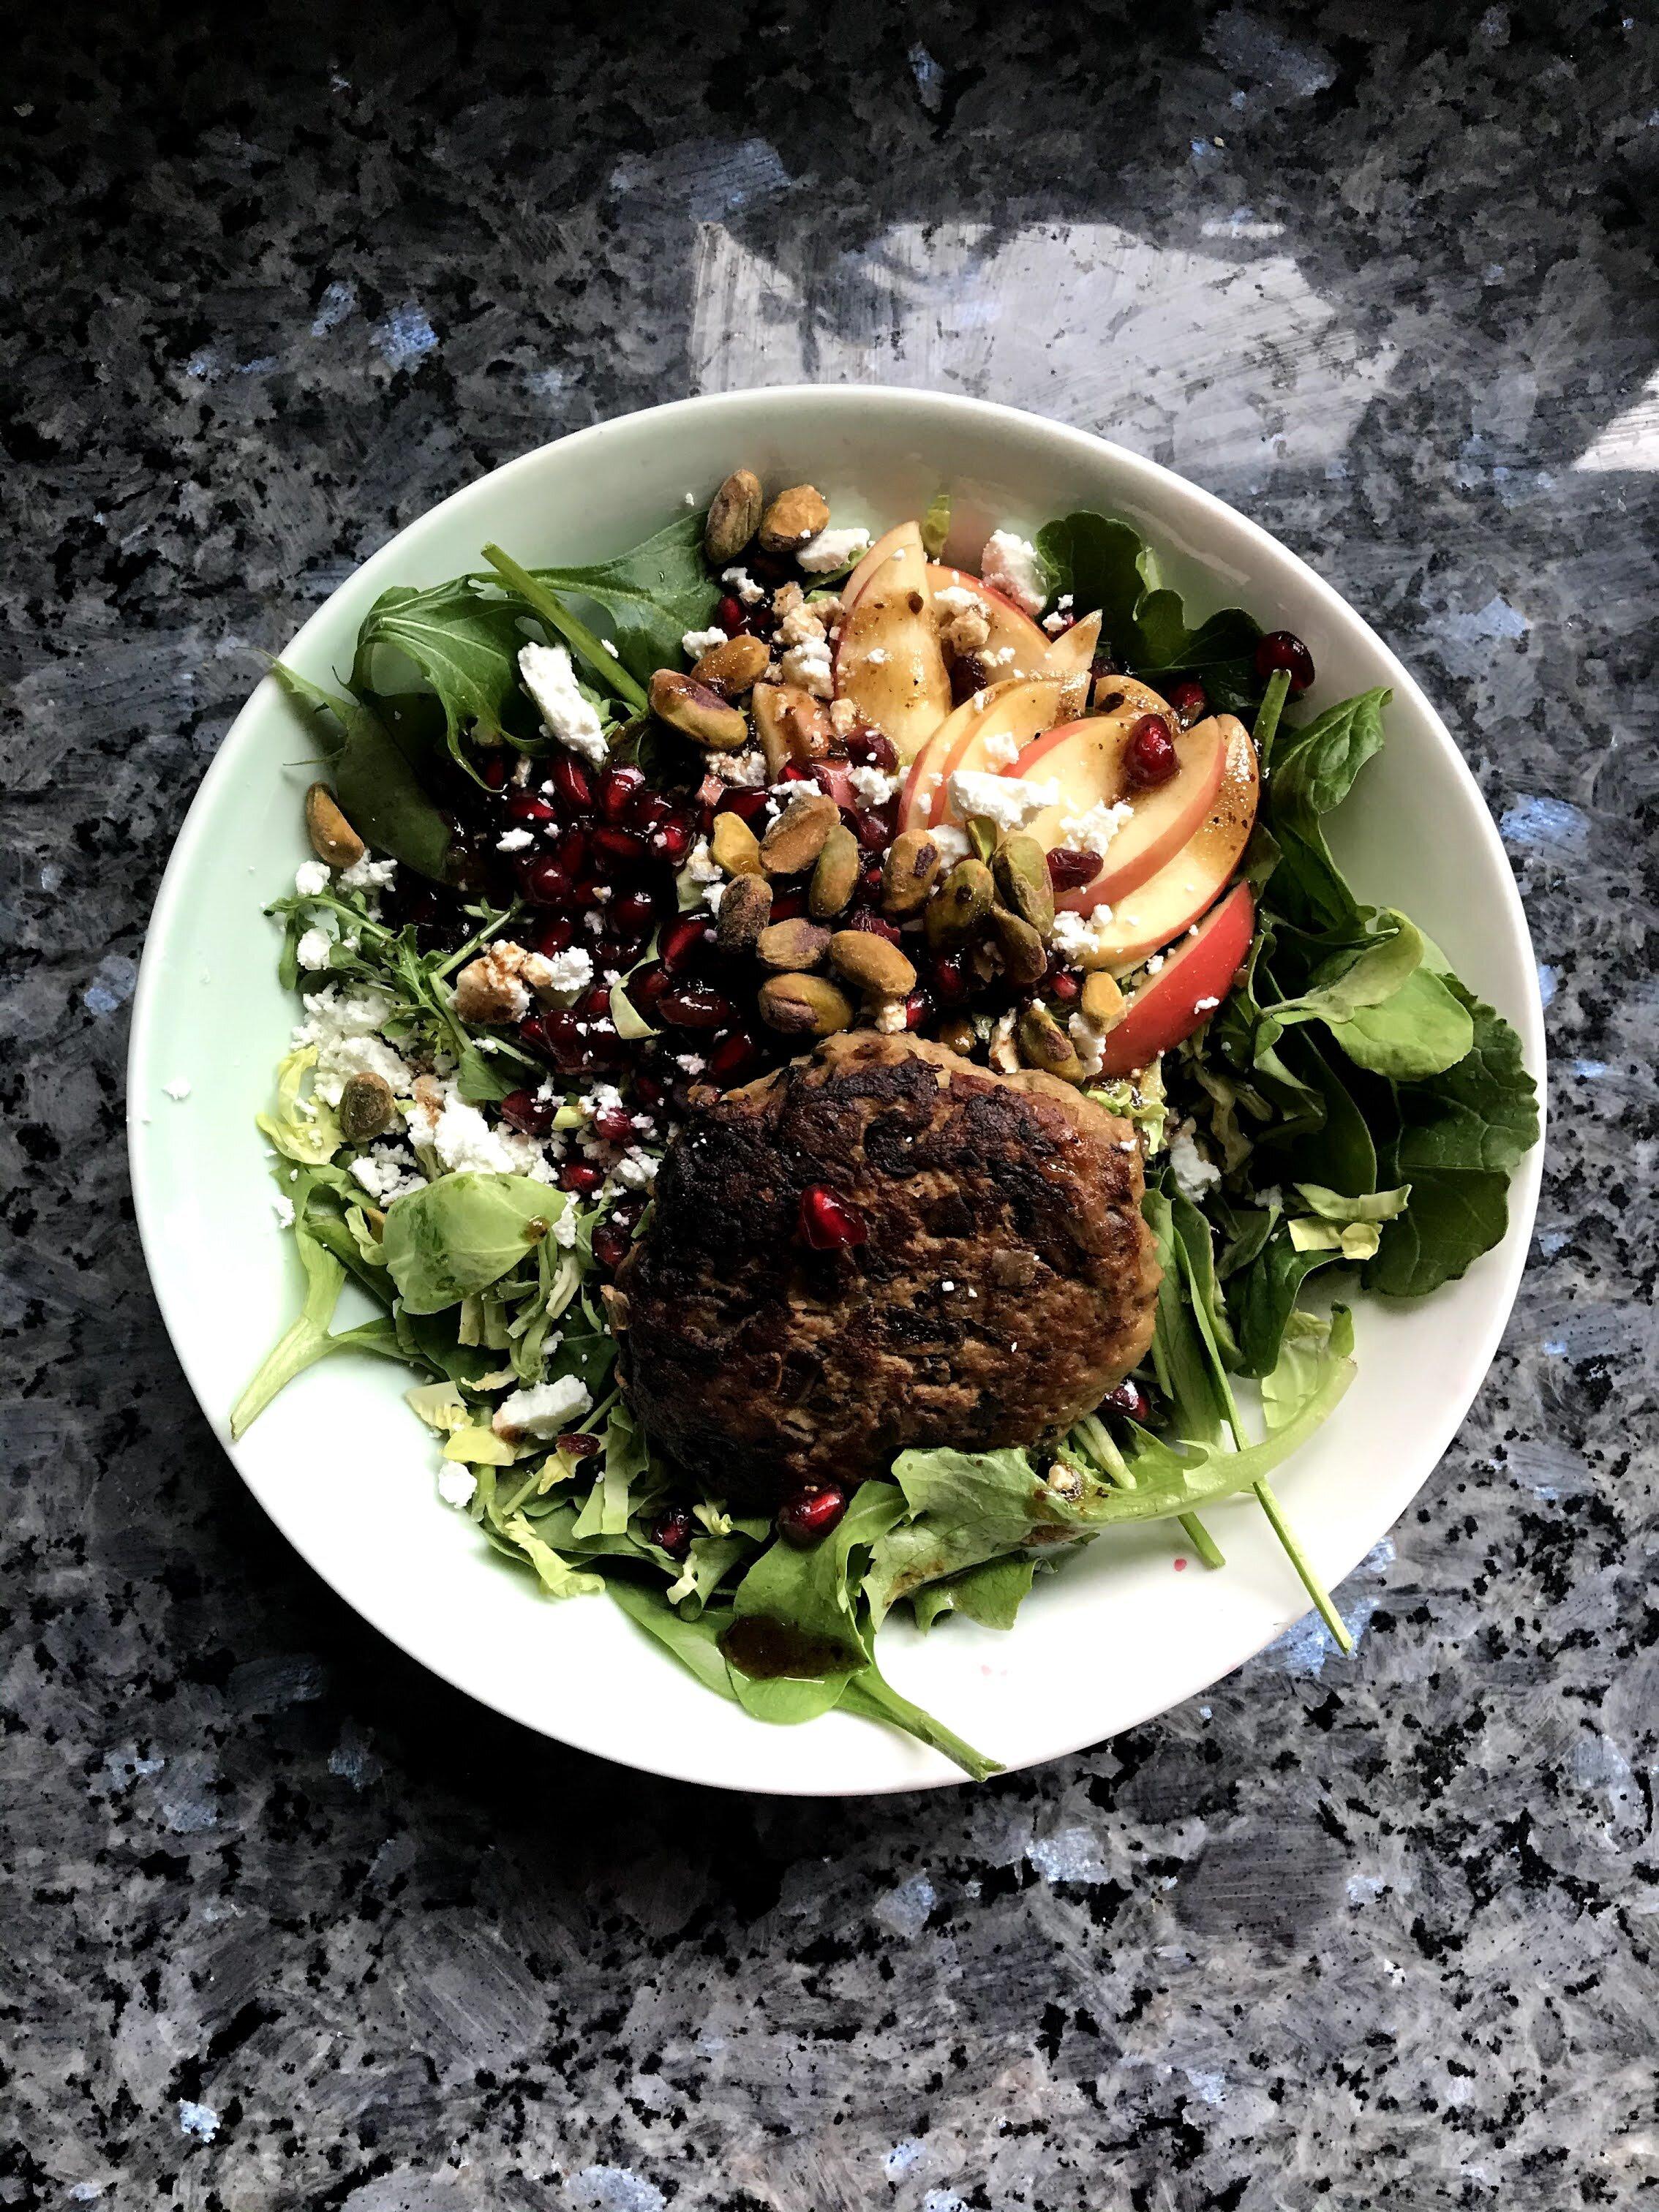 Turkey And Mushroom Burgers The Smithson Kitchen